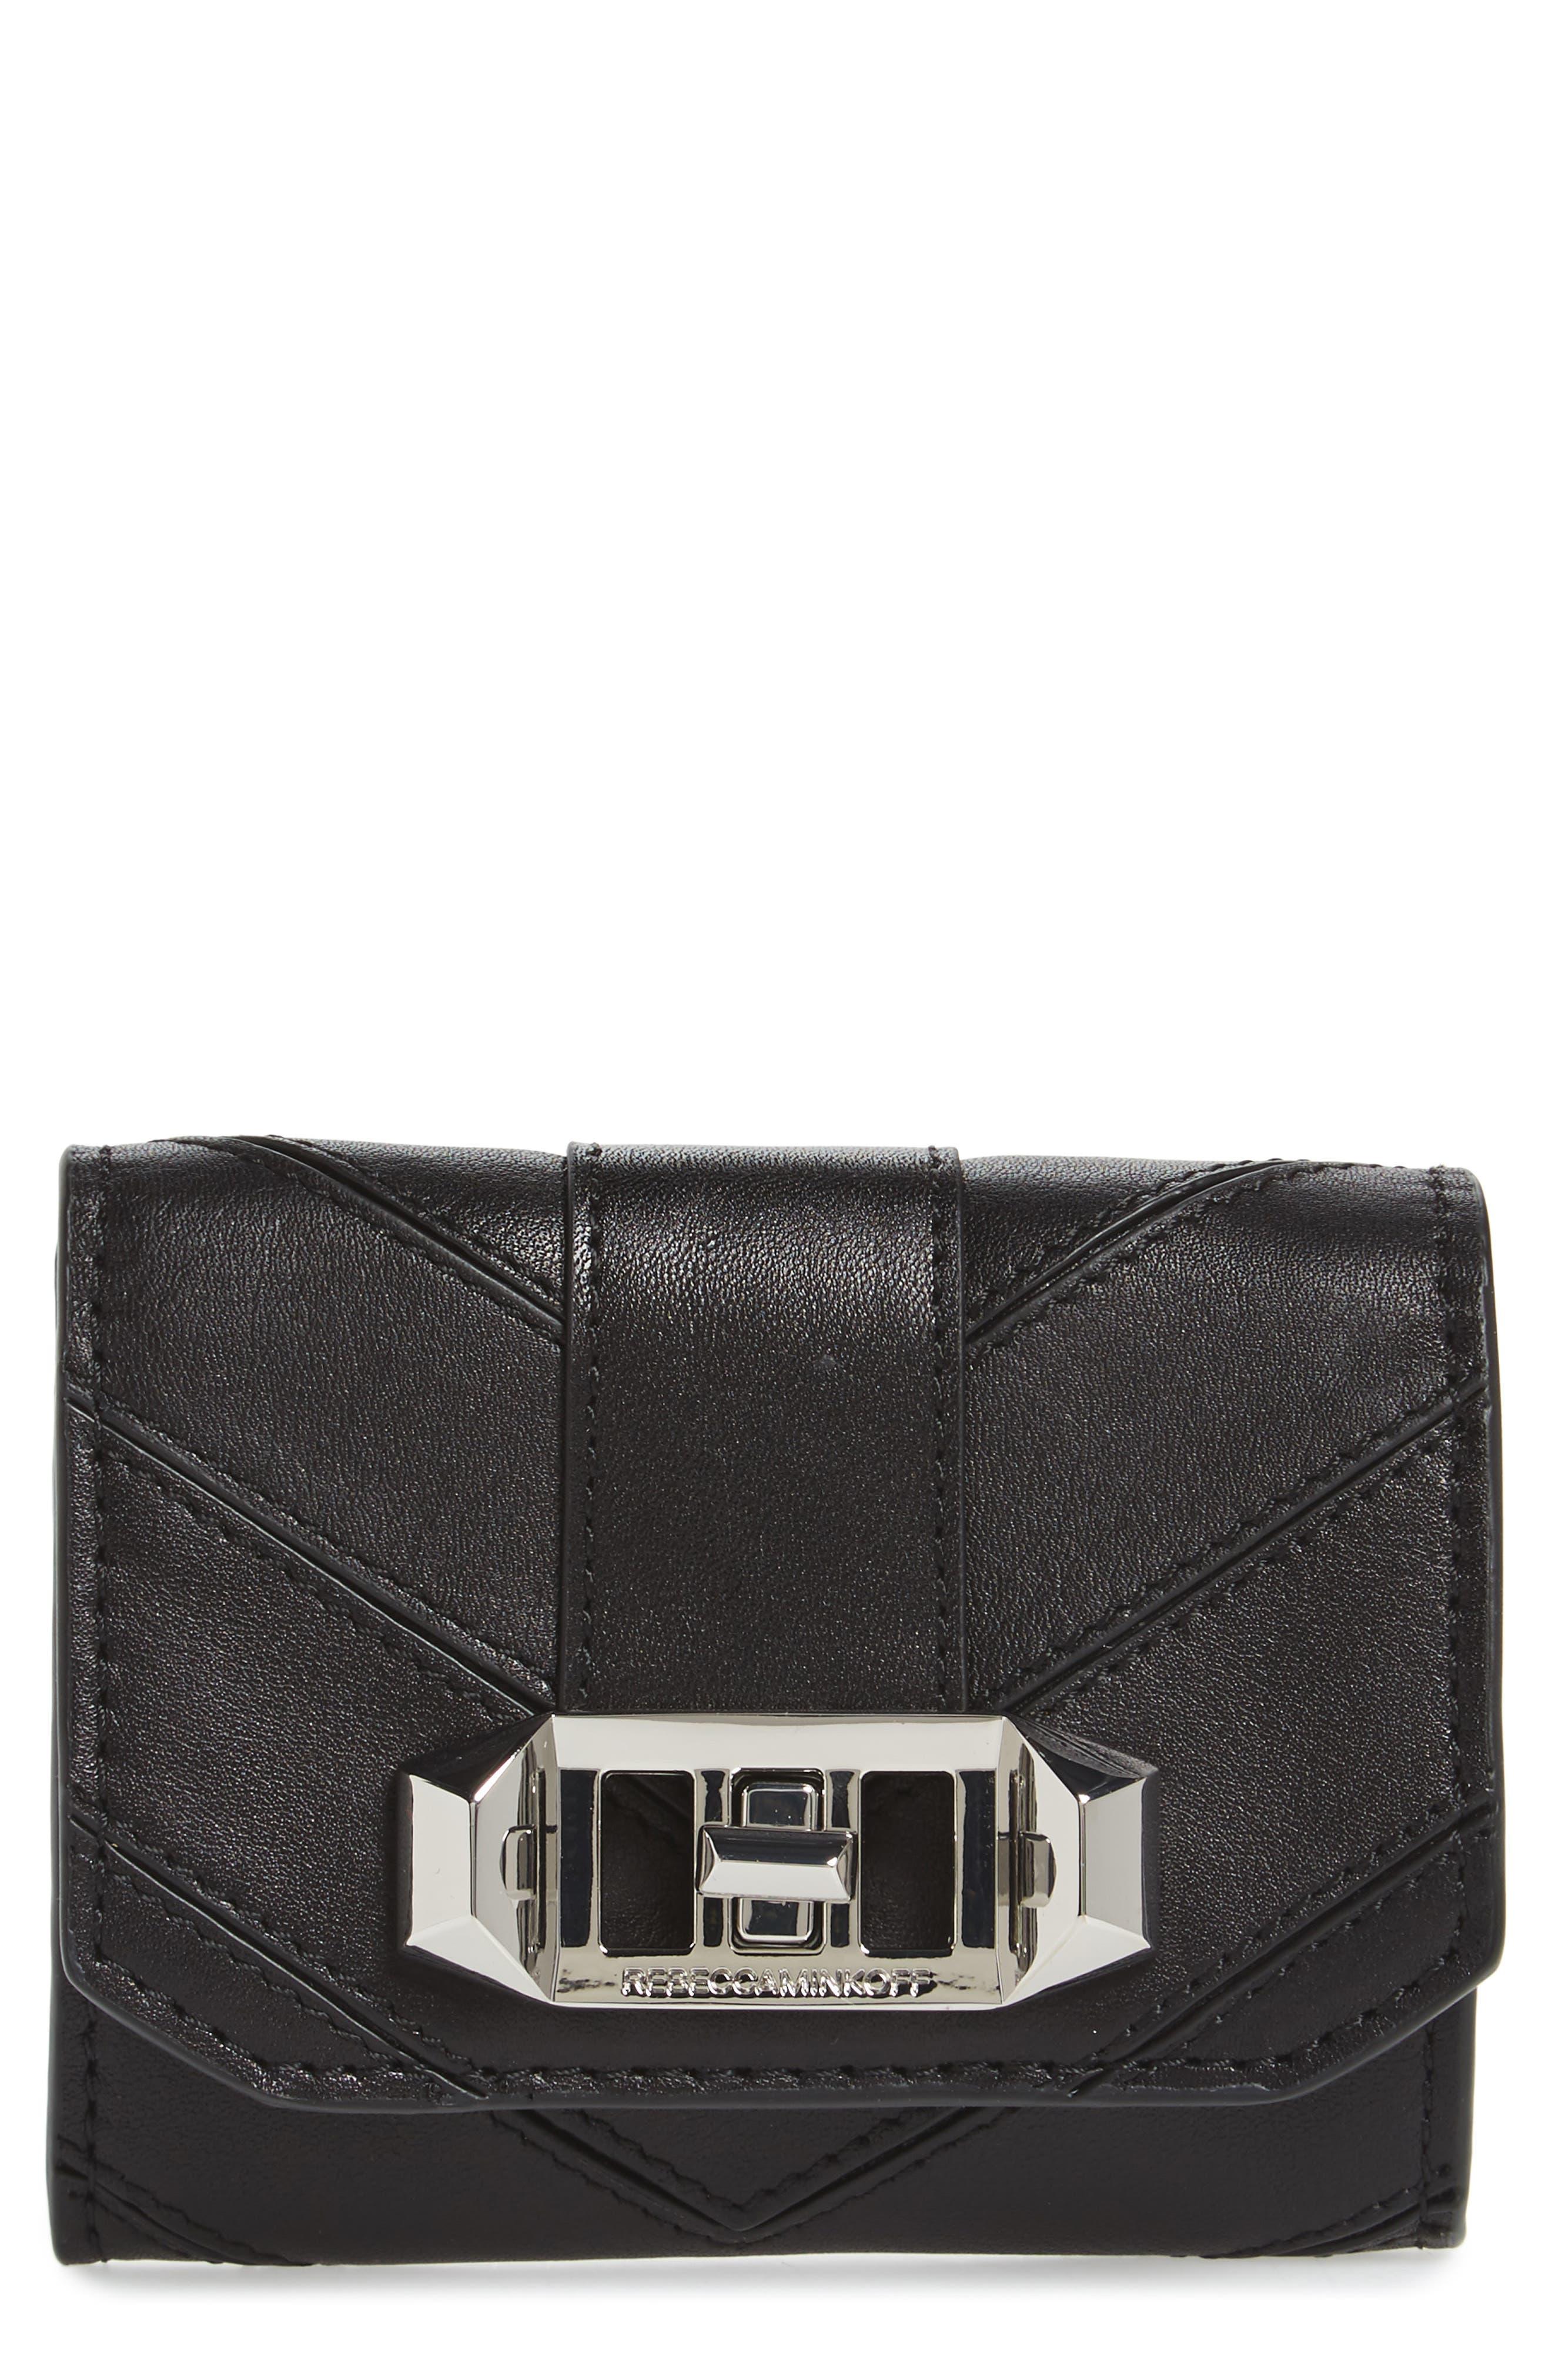 Rebecca Minkoff Love Lock Leather Wallet